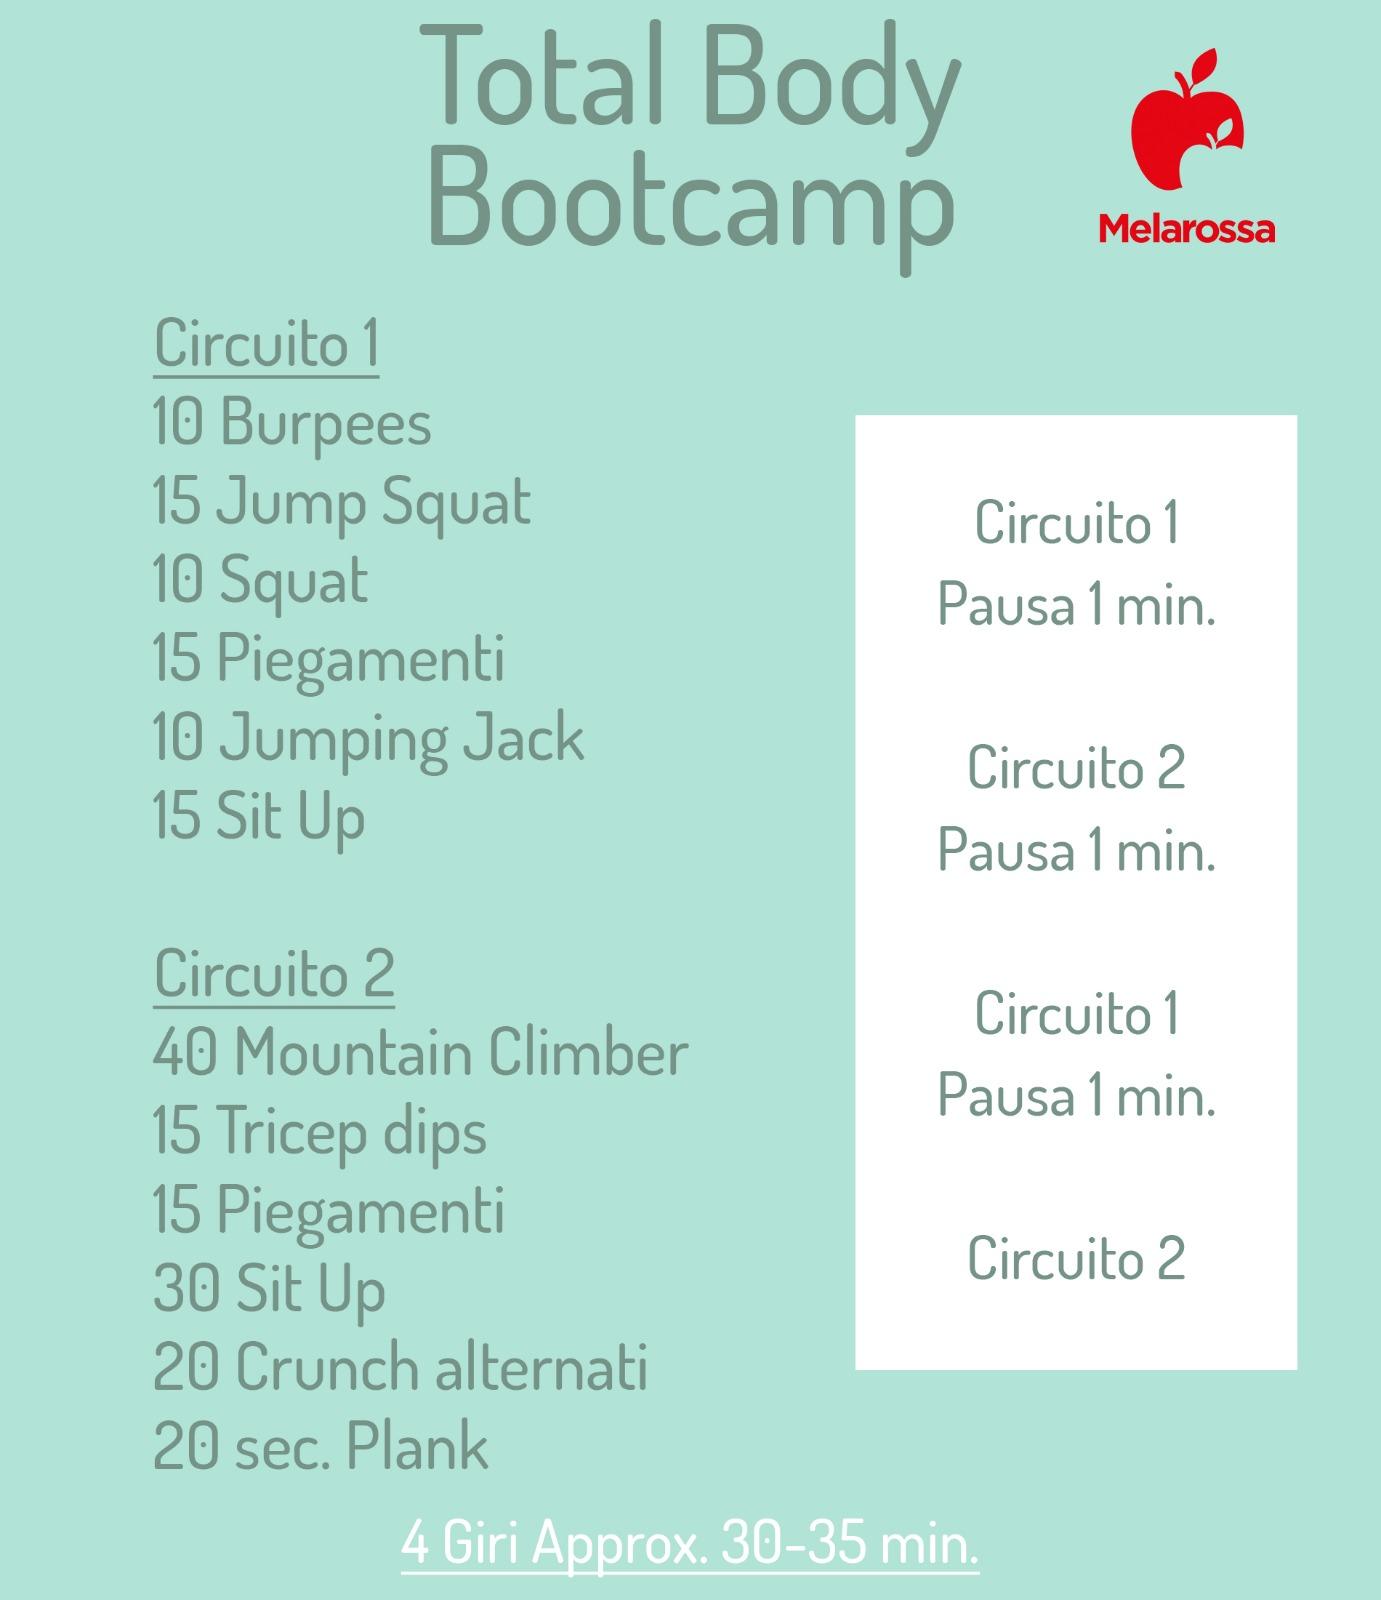 tabella allenamento bootcamp